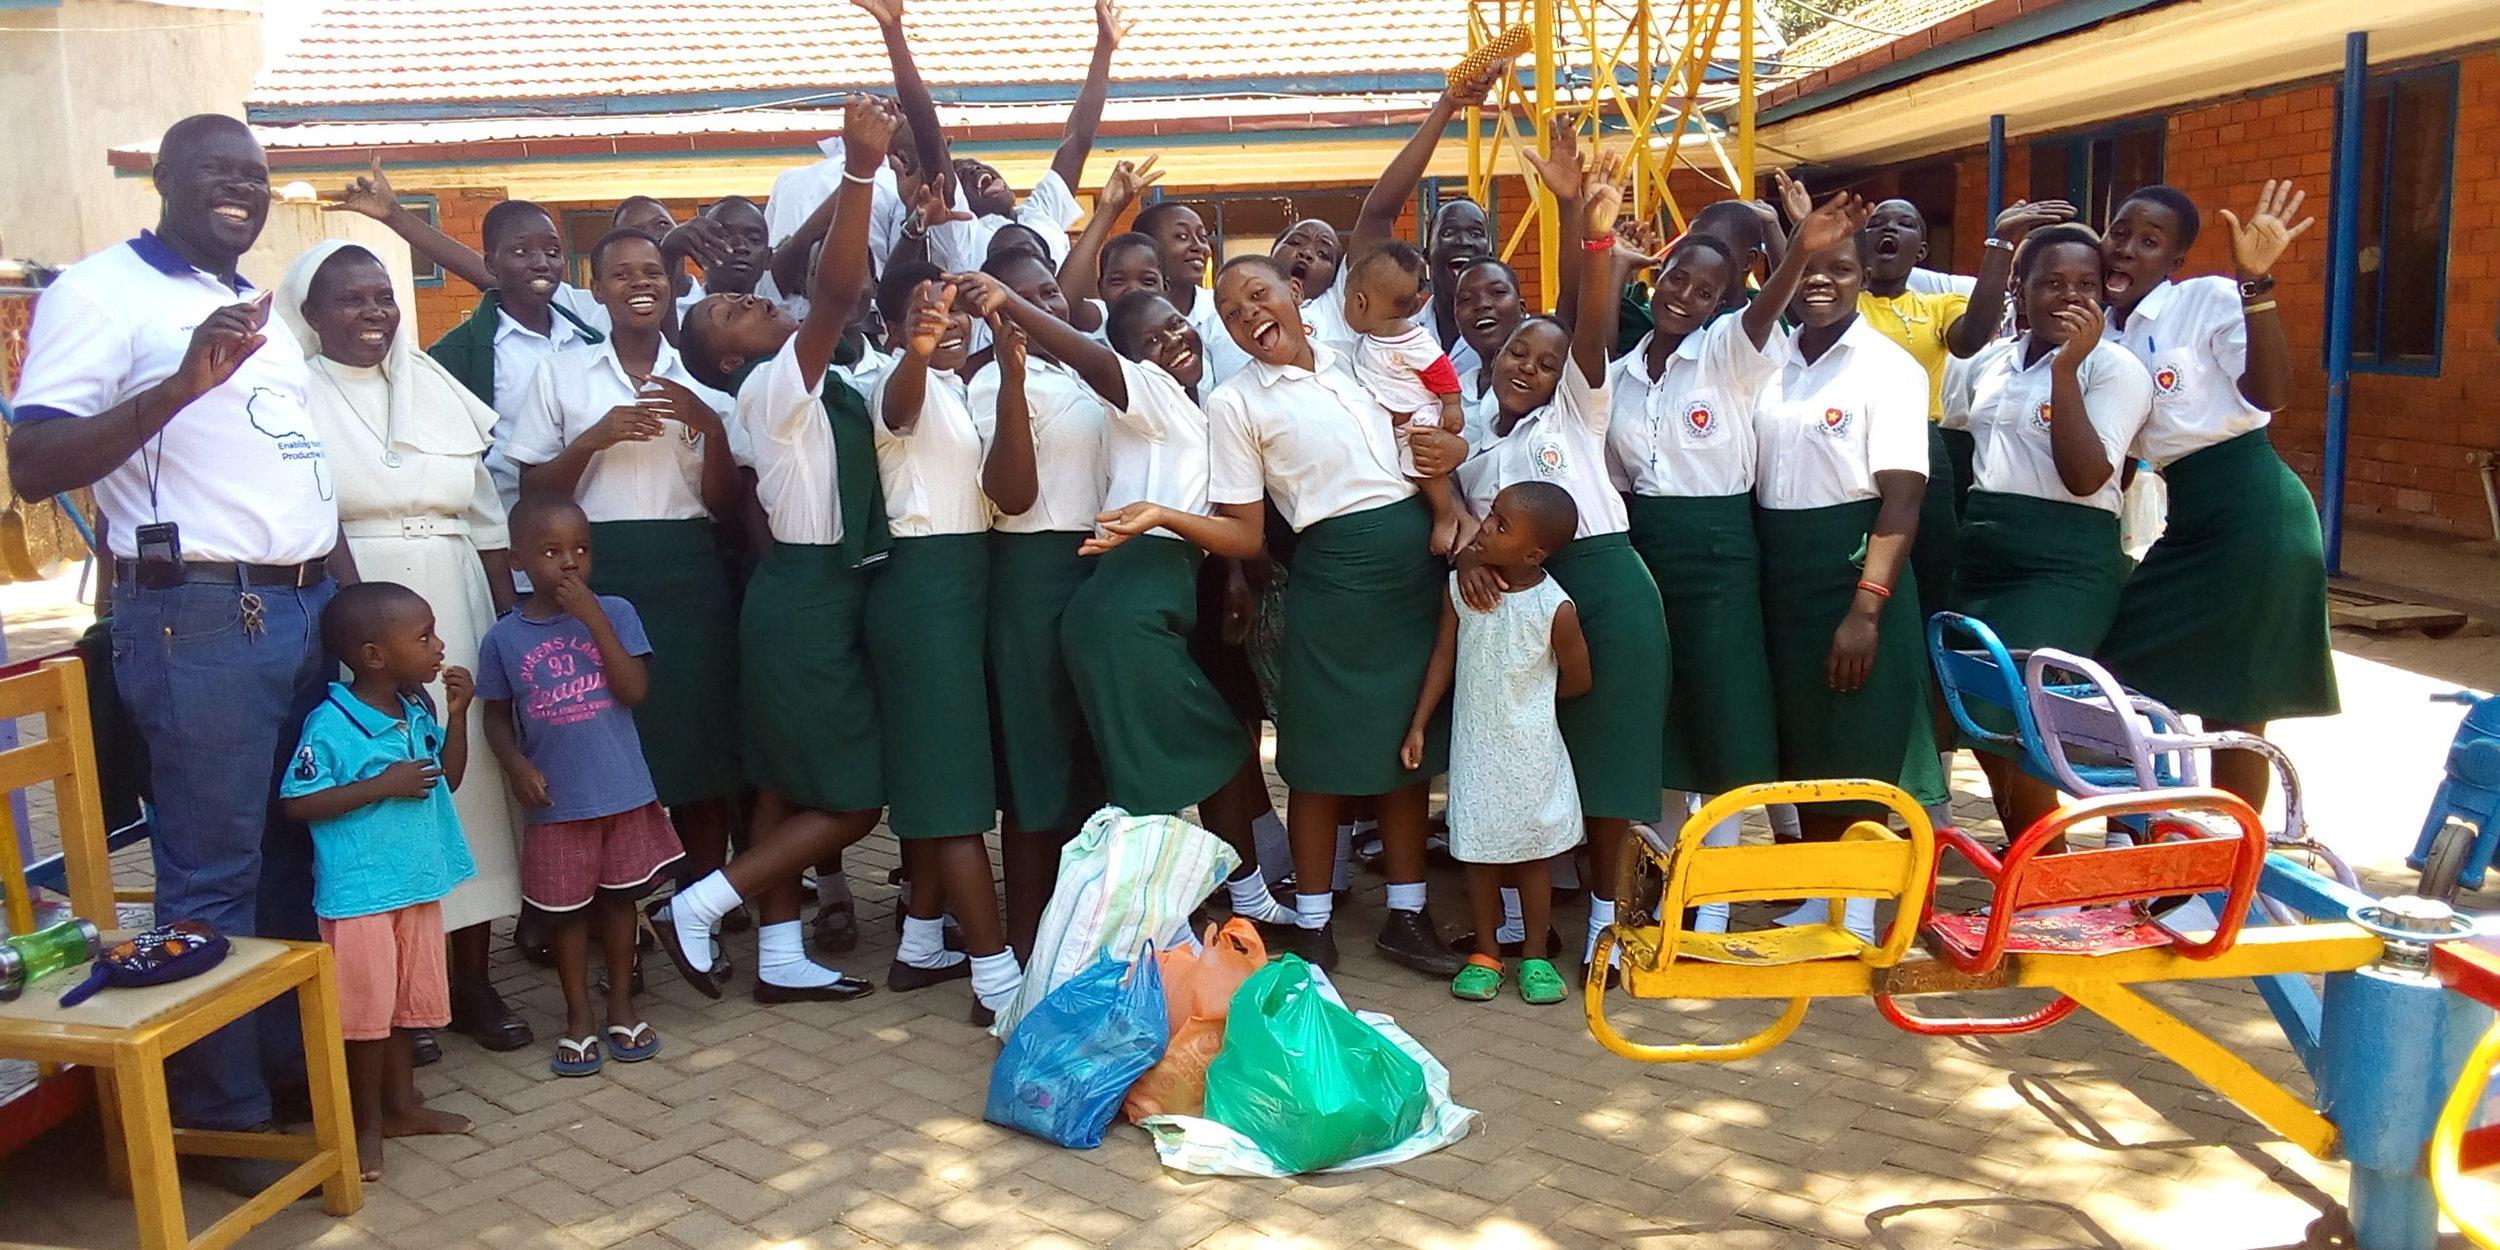 Group photo - COWA Nsambya.jpg